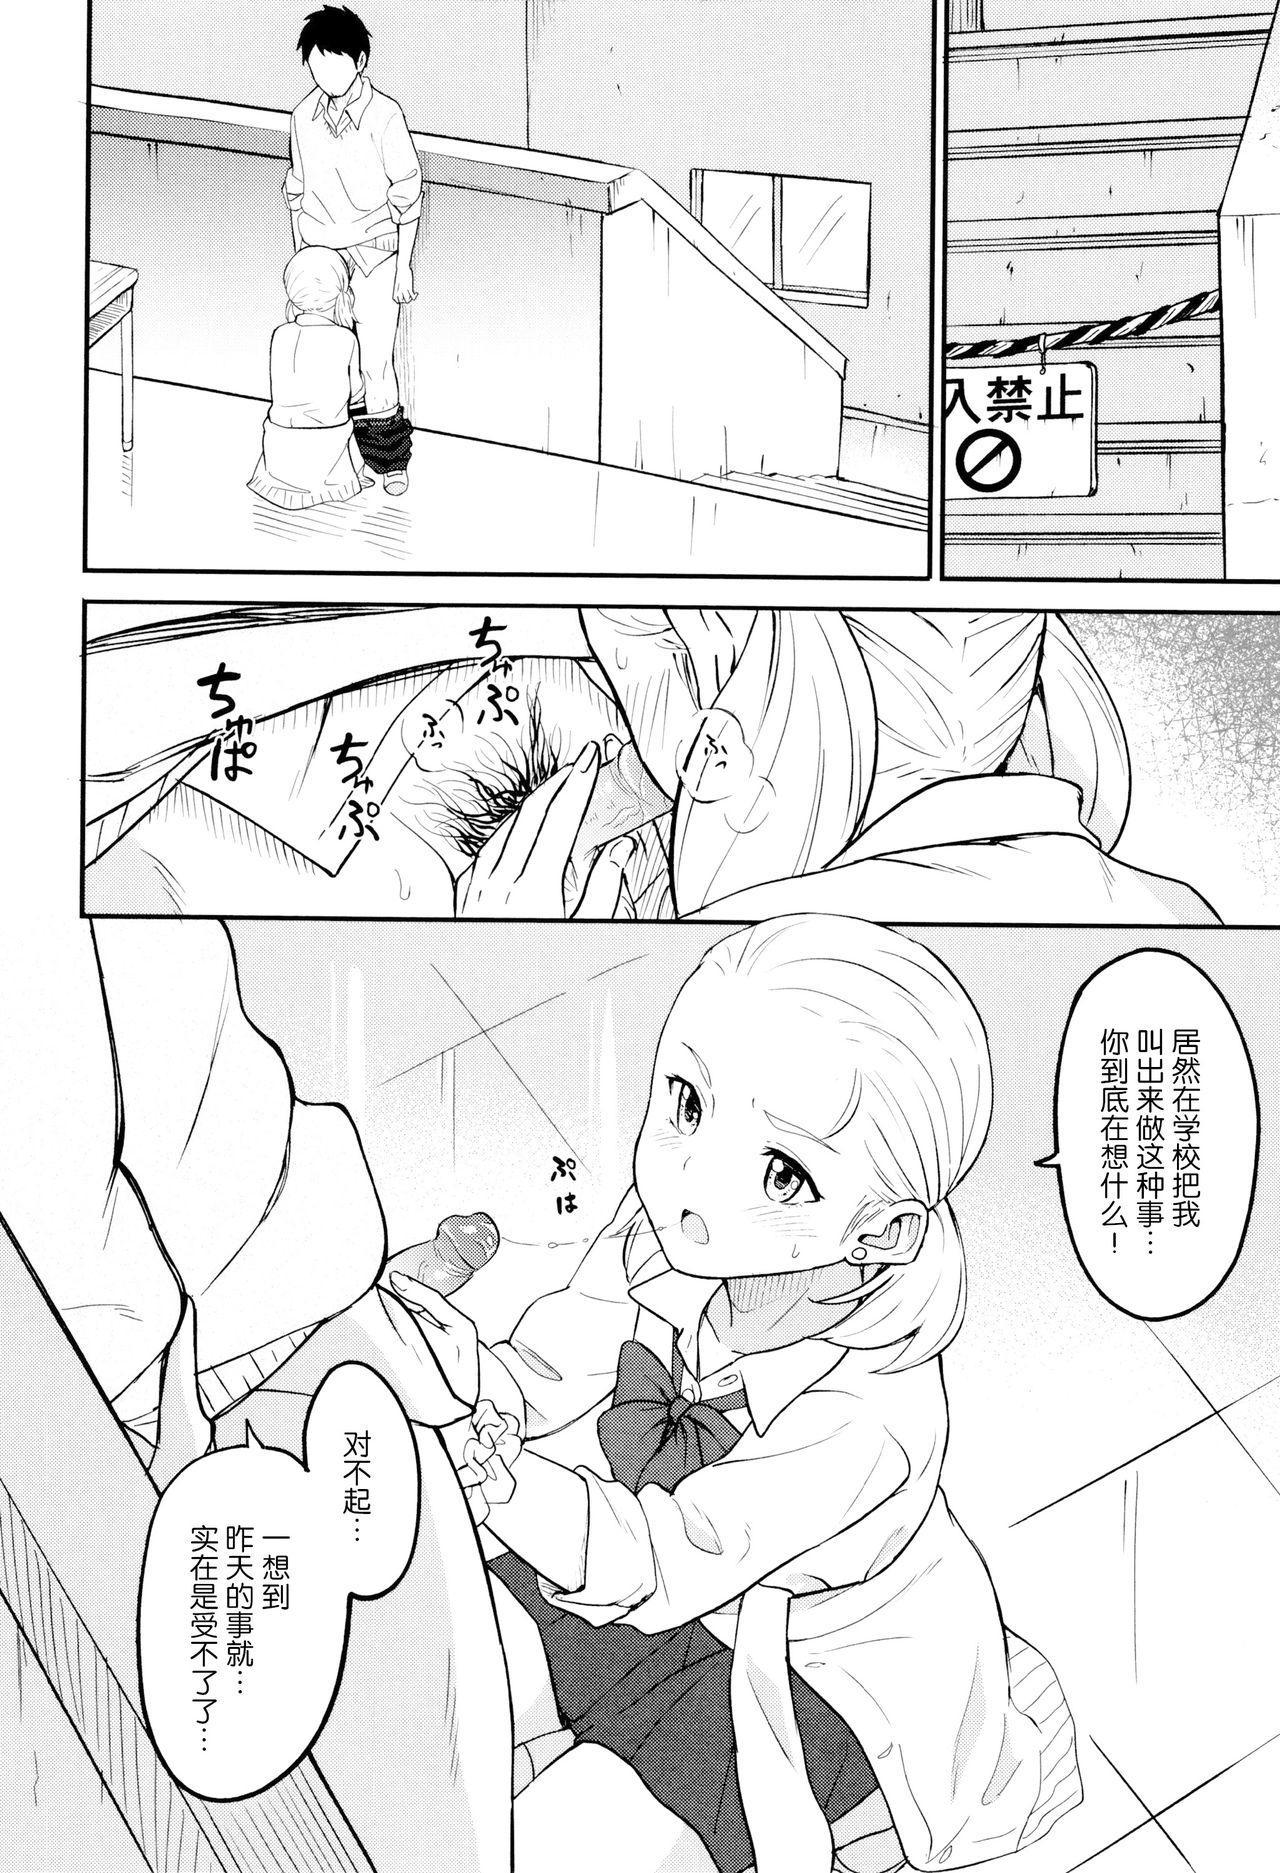 Tokubetsu na Mainichi - Special daily 78